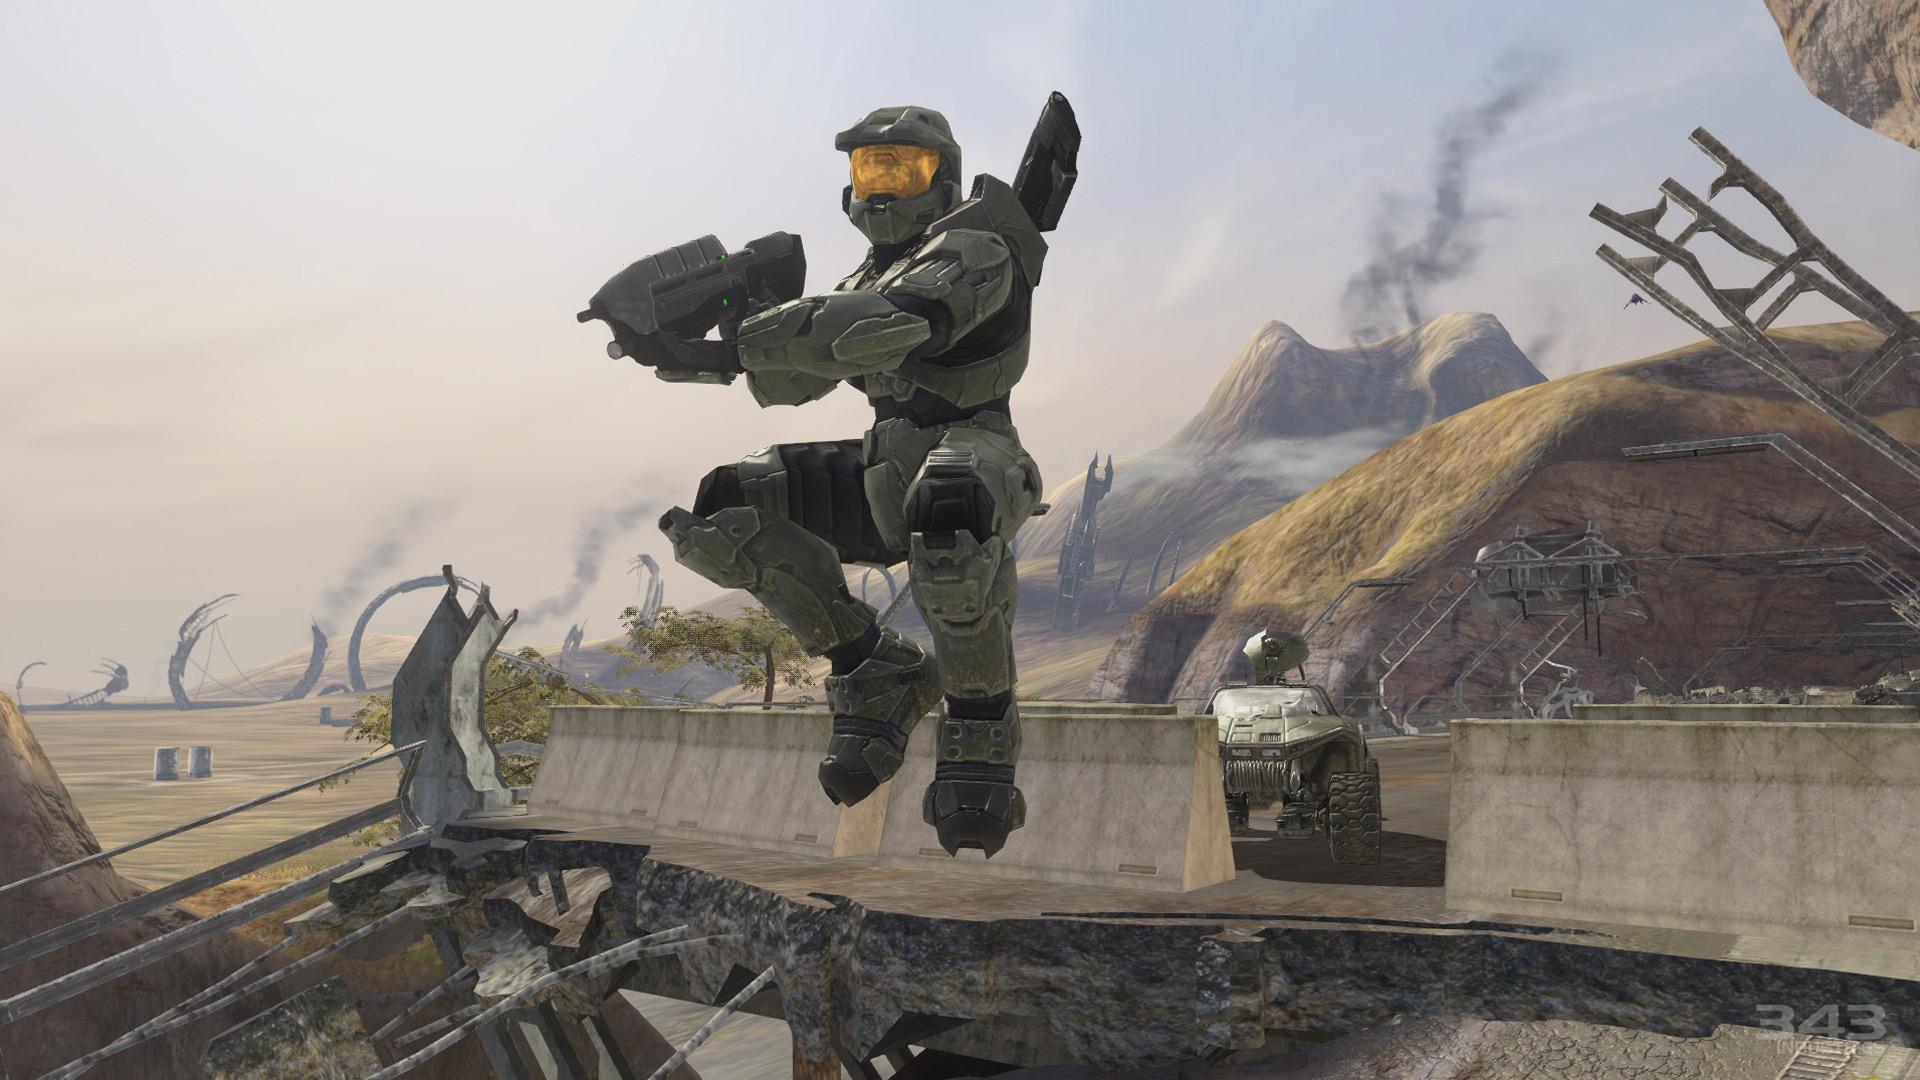 Halo's PC ports won't require Windows 10